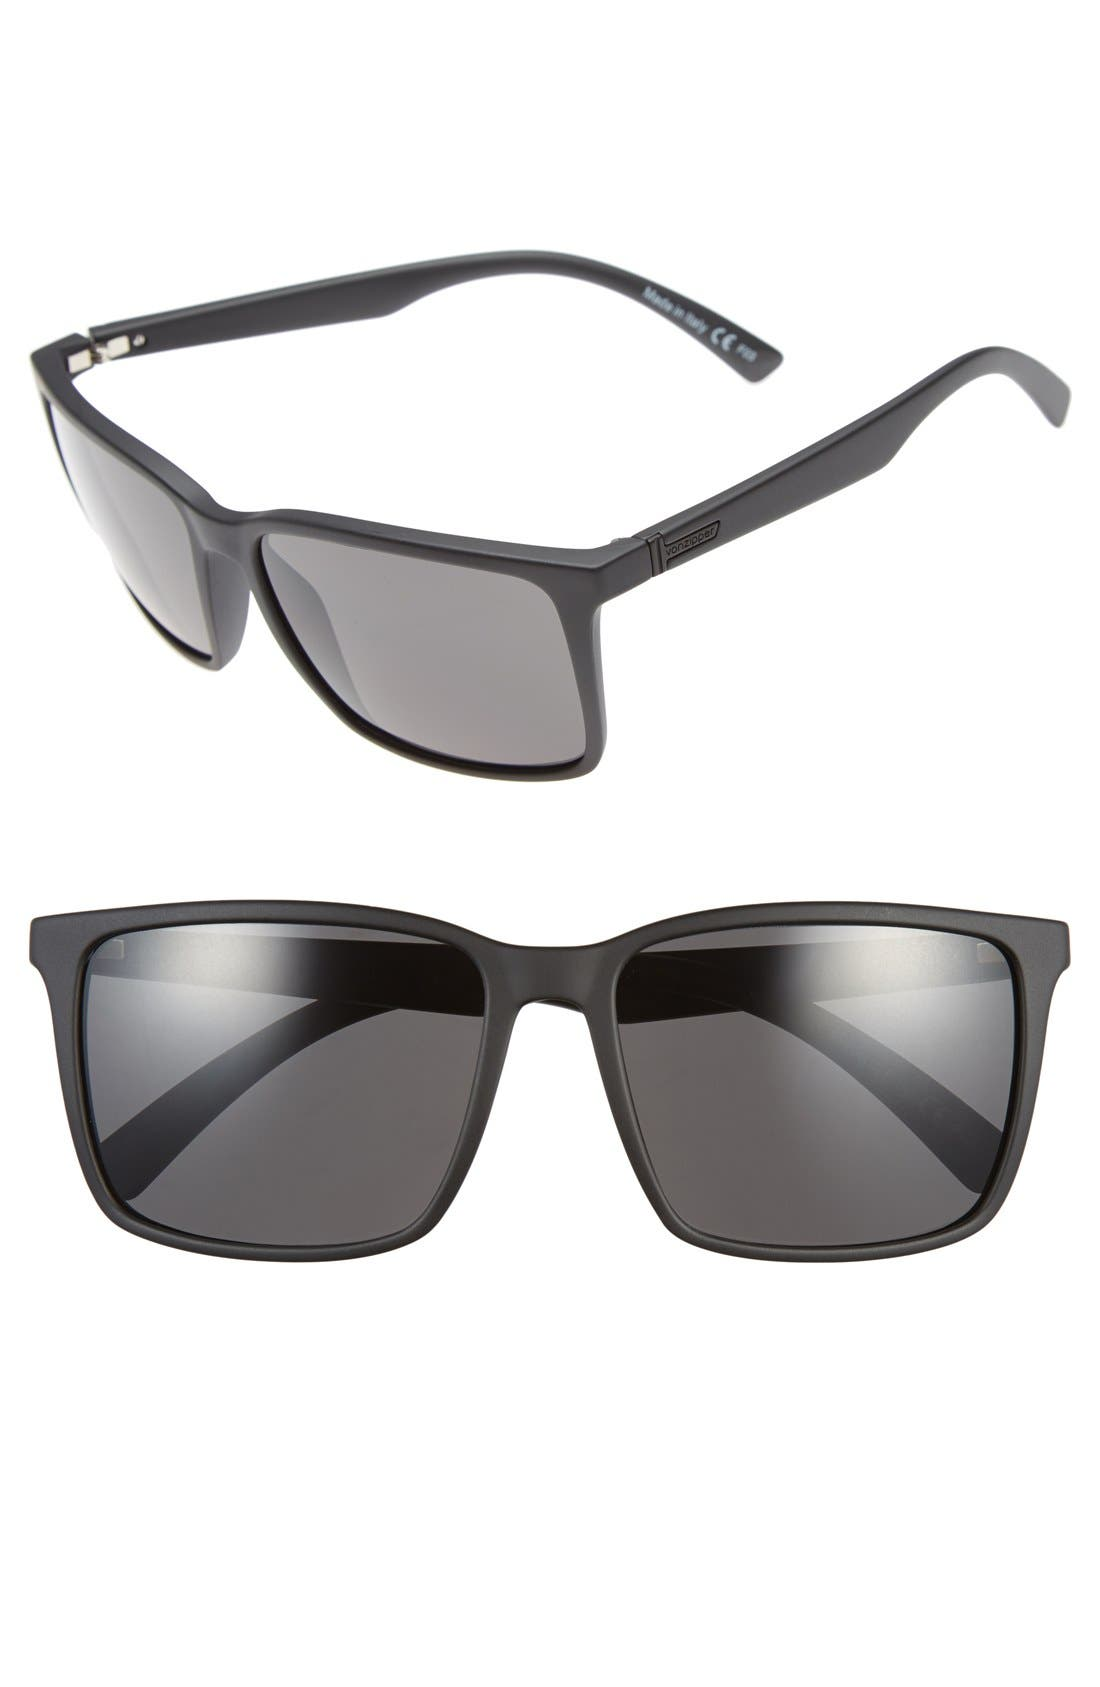 Main Image - Von Zipper 'Lensmore' 58mm Sunglasses